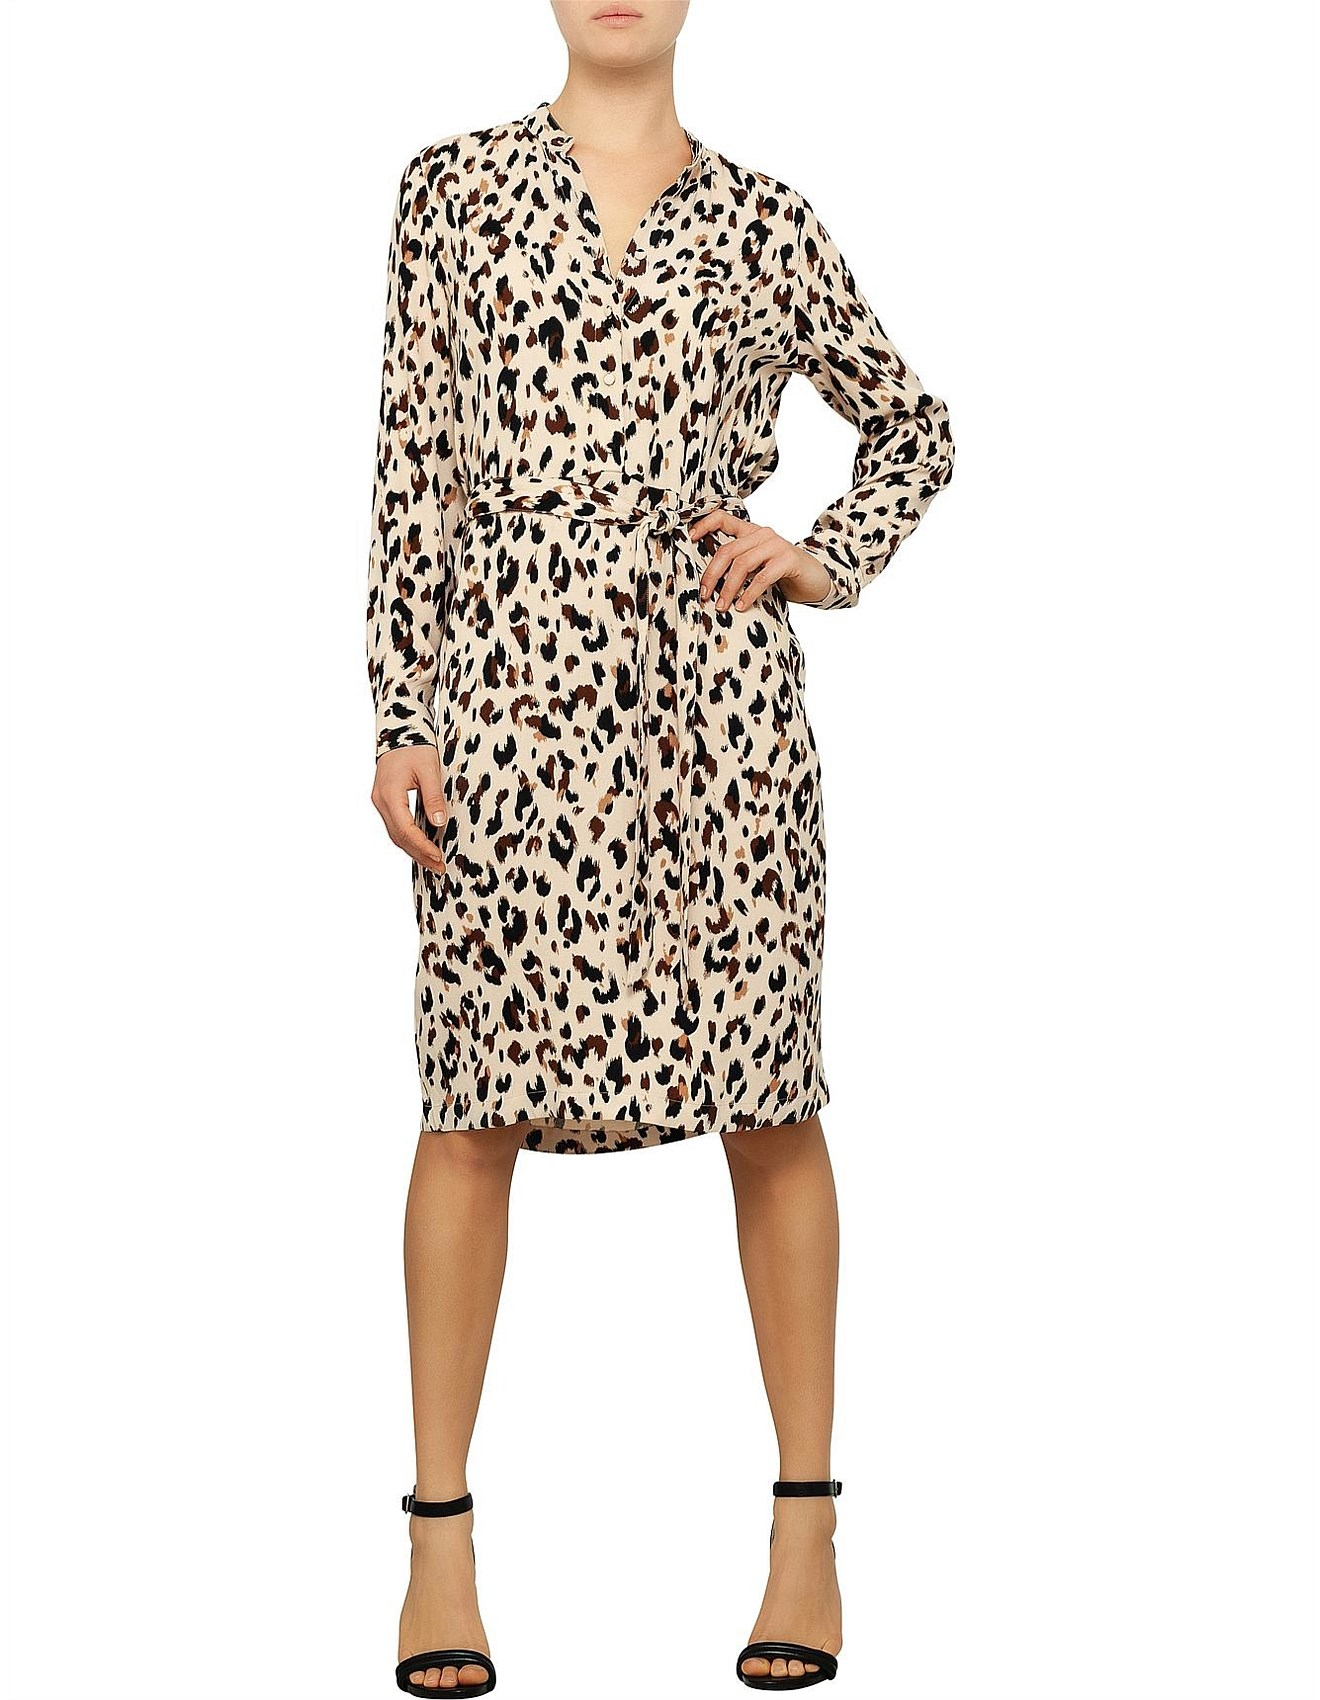 84628fa6 Animal Print Dress